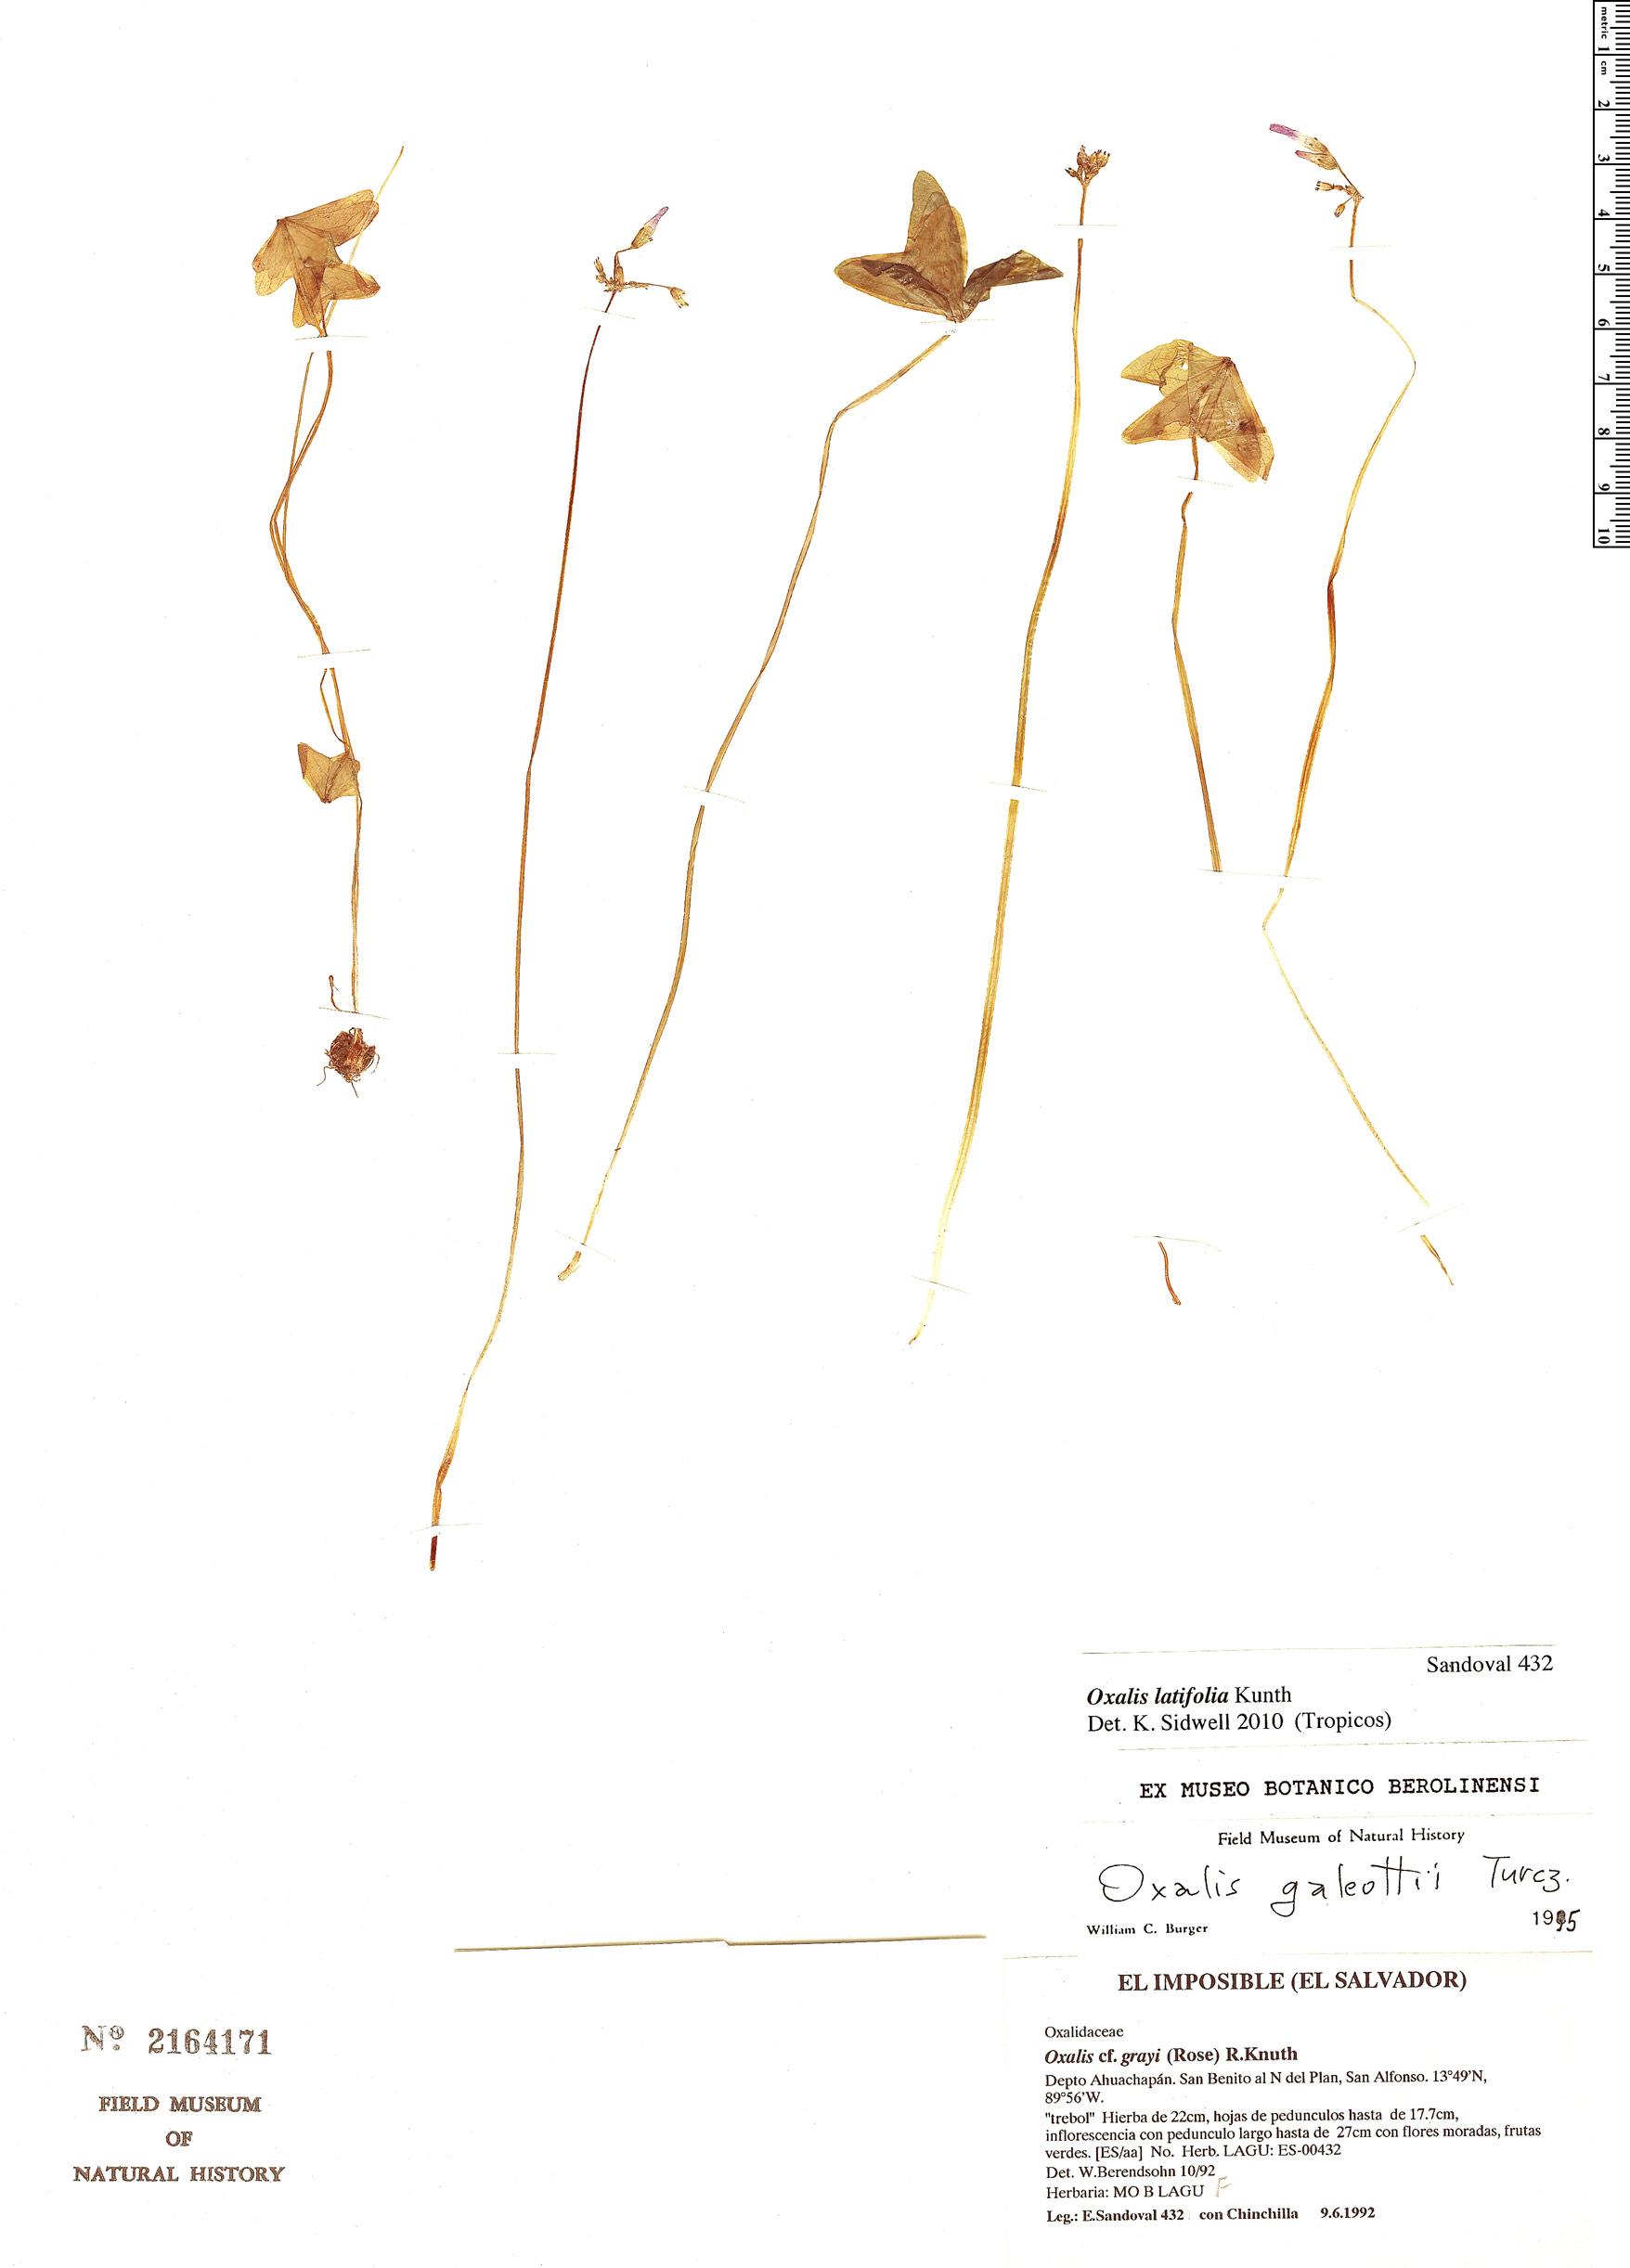 Specimen: Oxalis latifolia